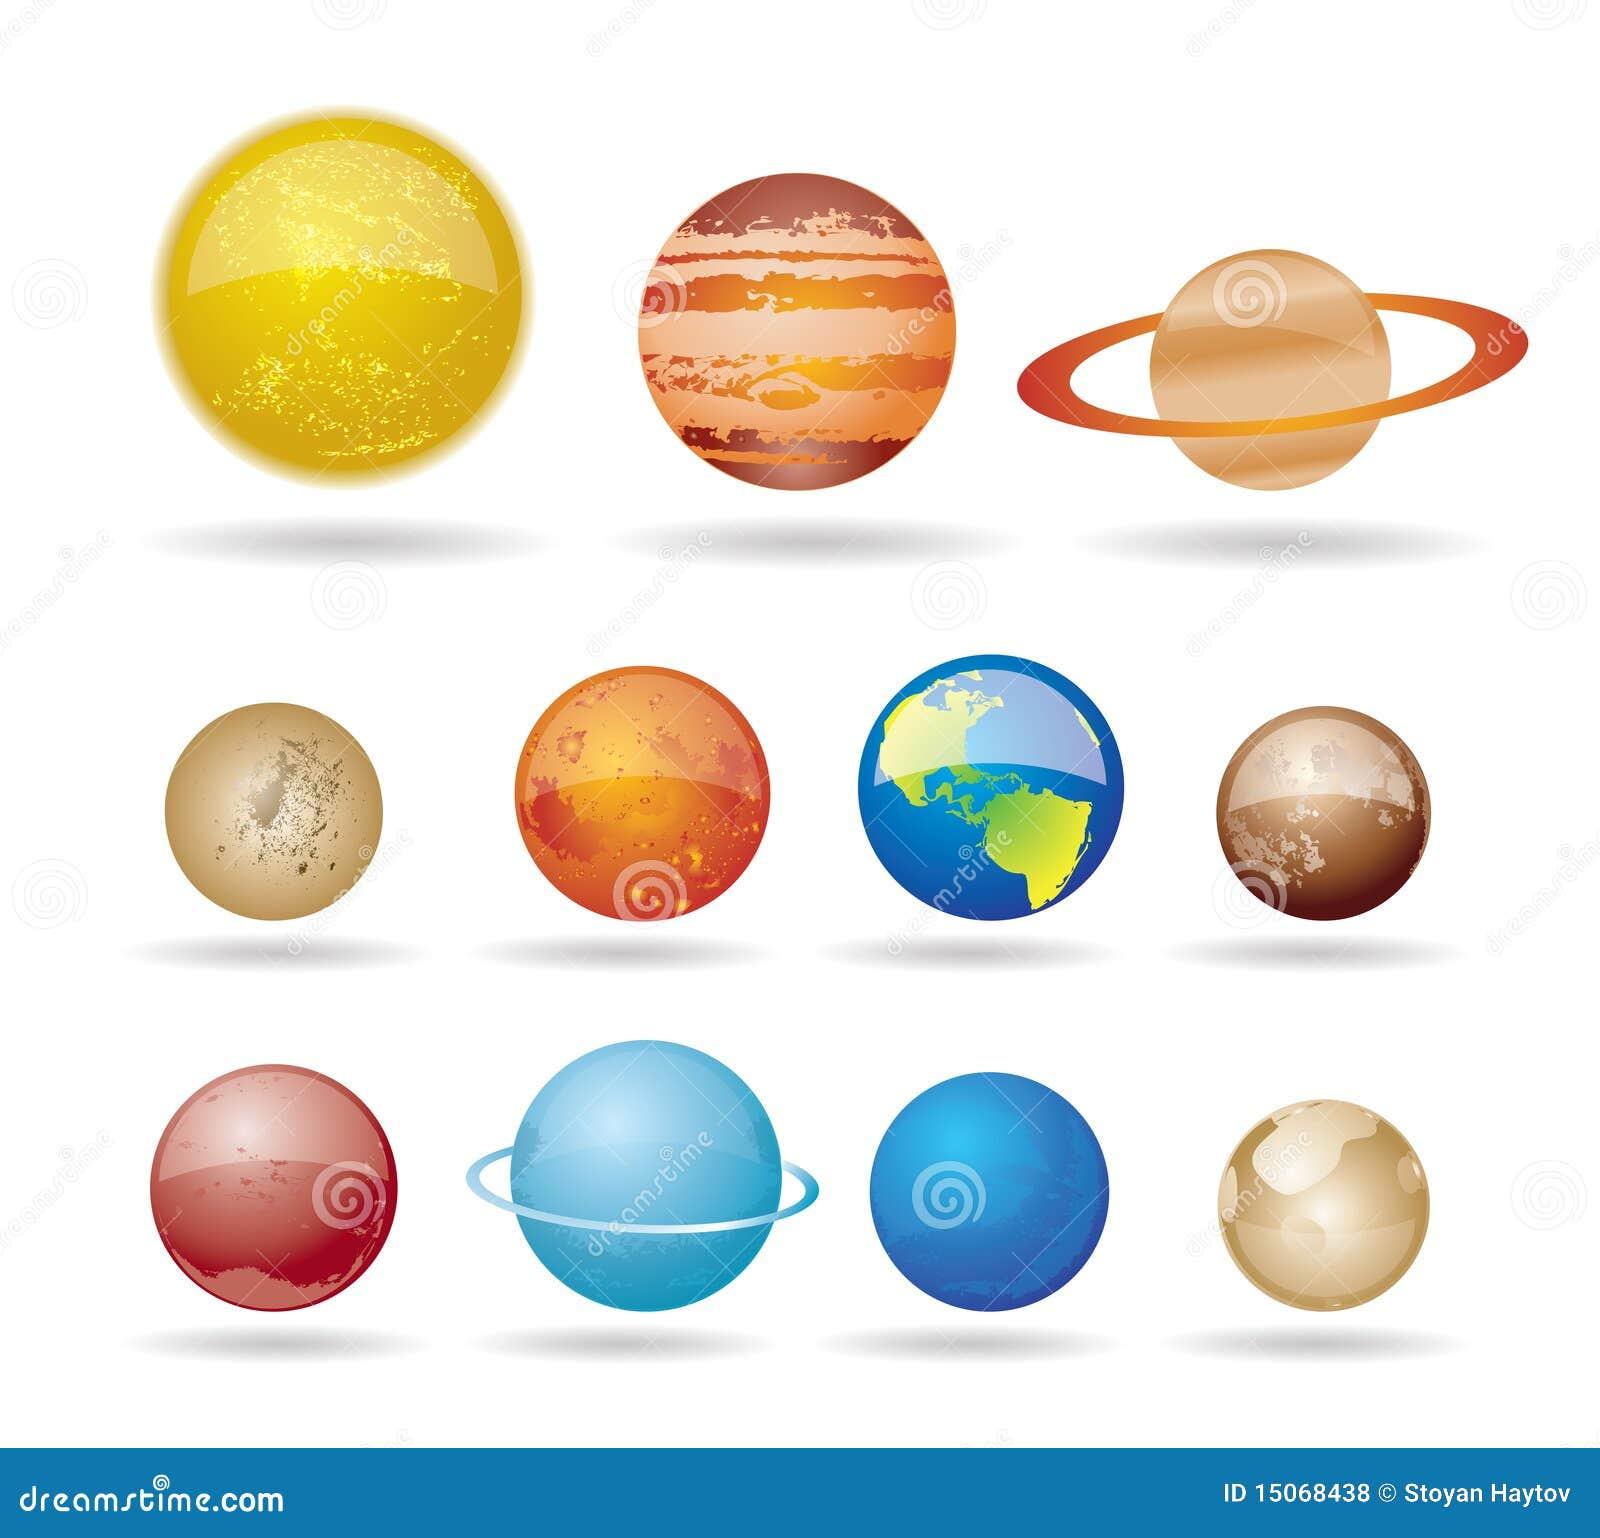 Planetas E Sol De Nosso Sistema Solar Fotos de Stock ...